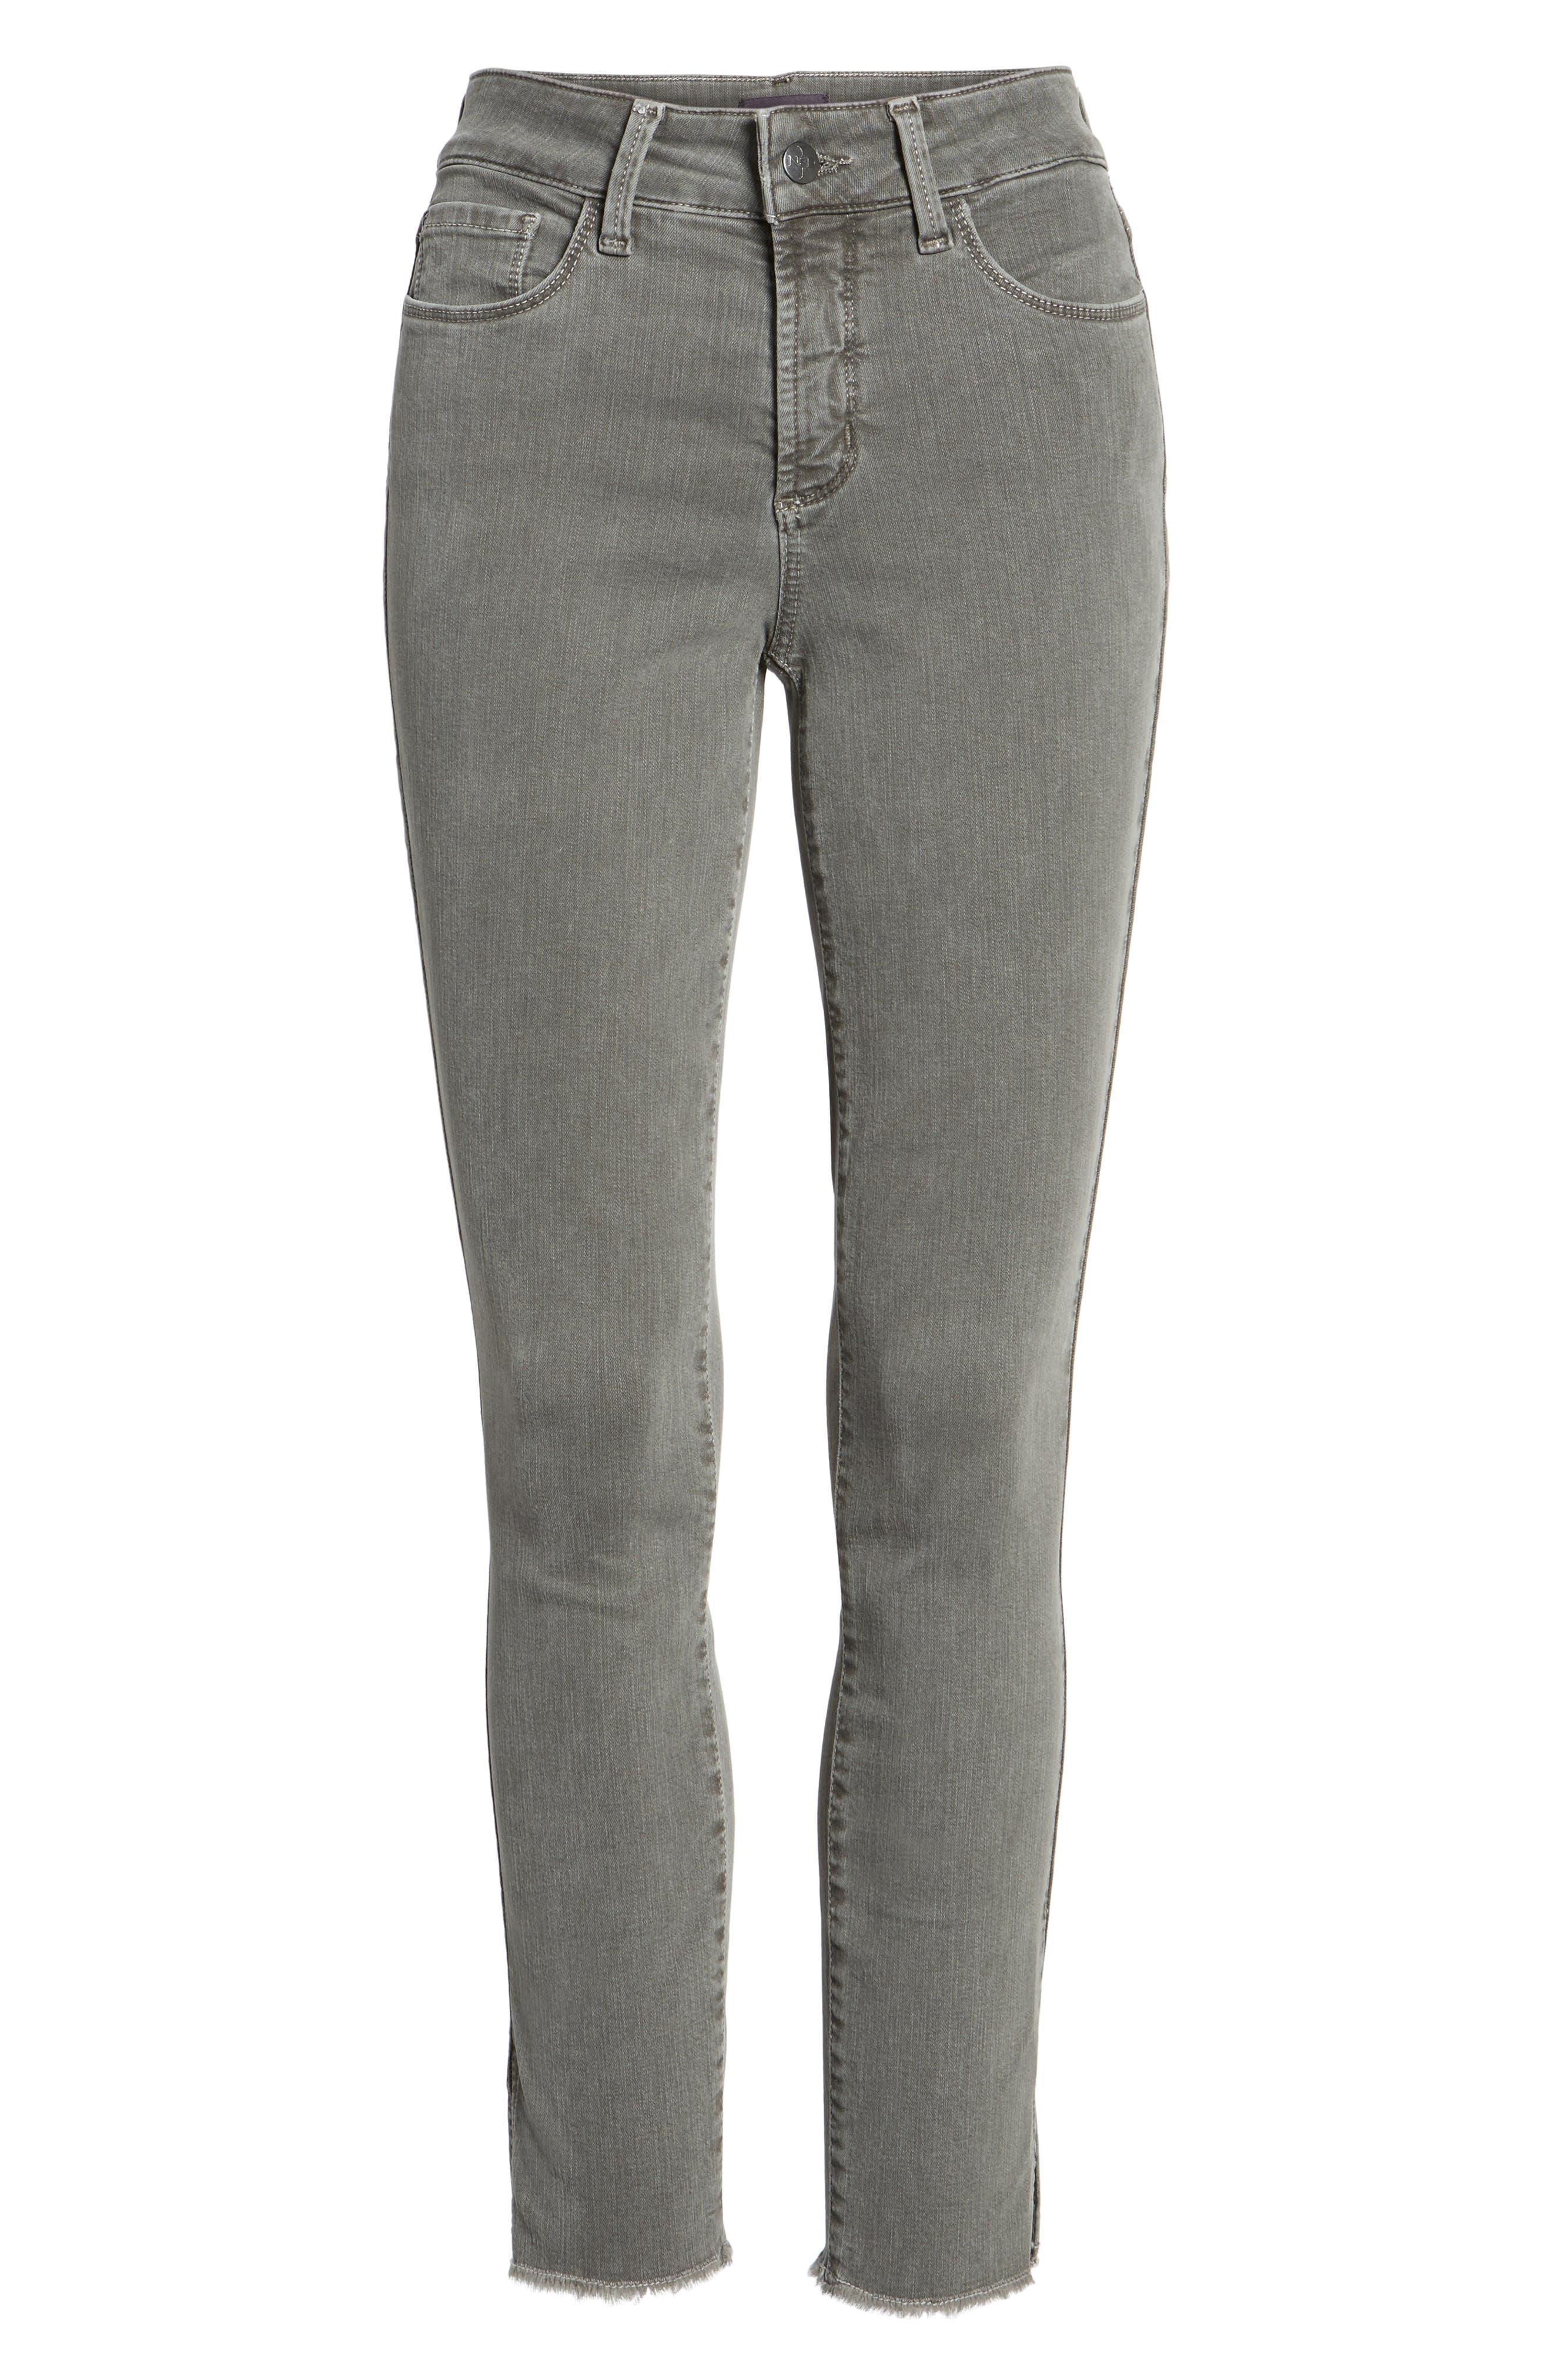 Ami Frayed Hem Stretch Skinny Ankle Jeans,                             Alternate thumbnail 6, color,                             038